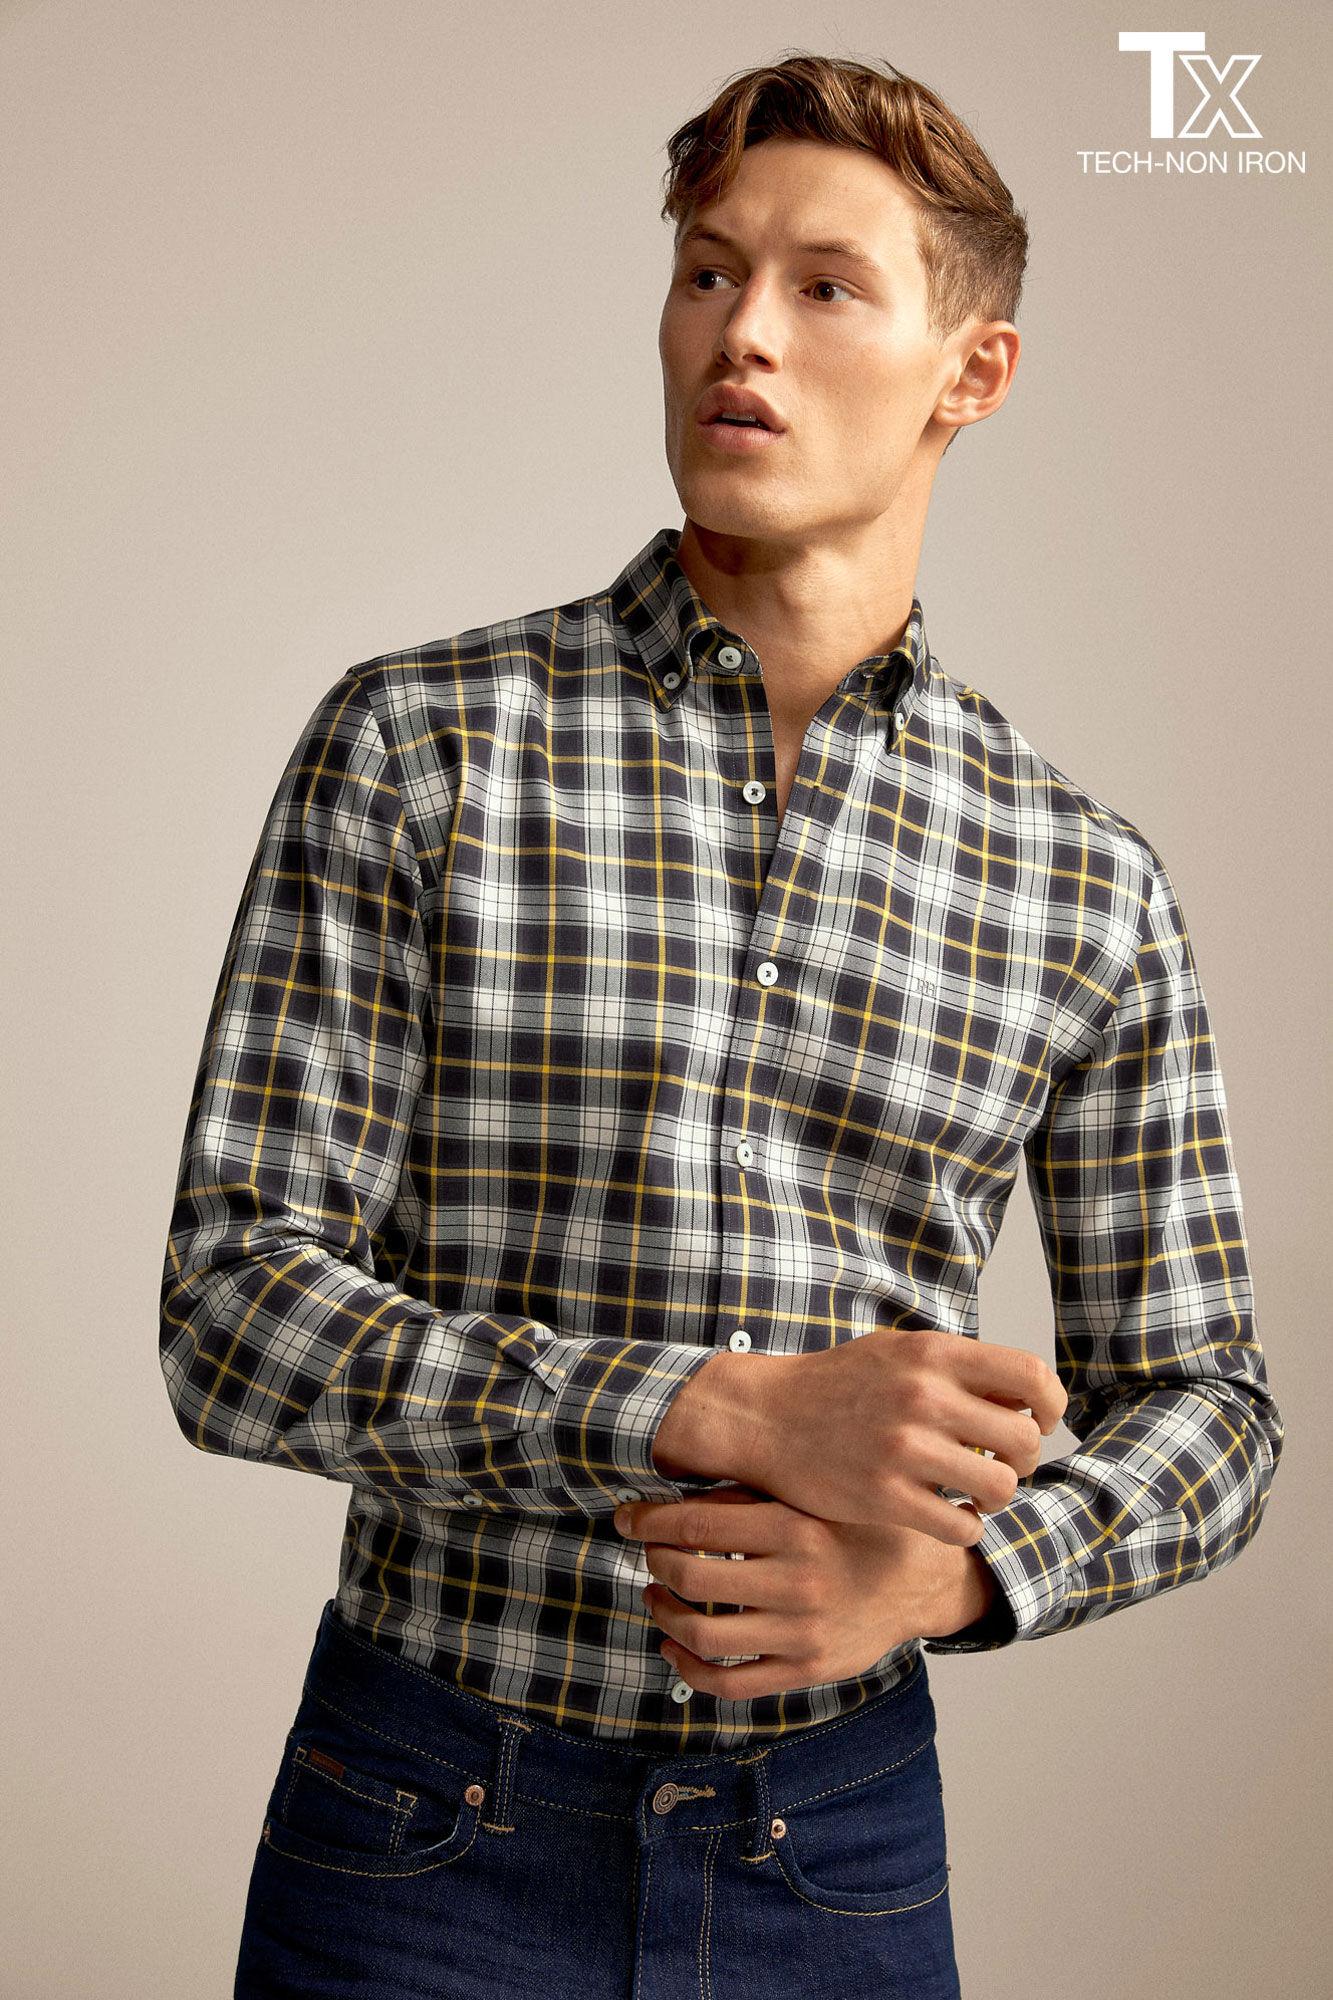 Camisa tech non iron xadrez tartã